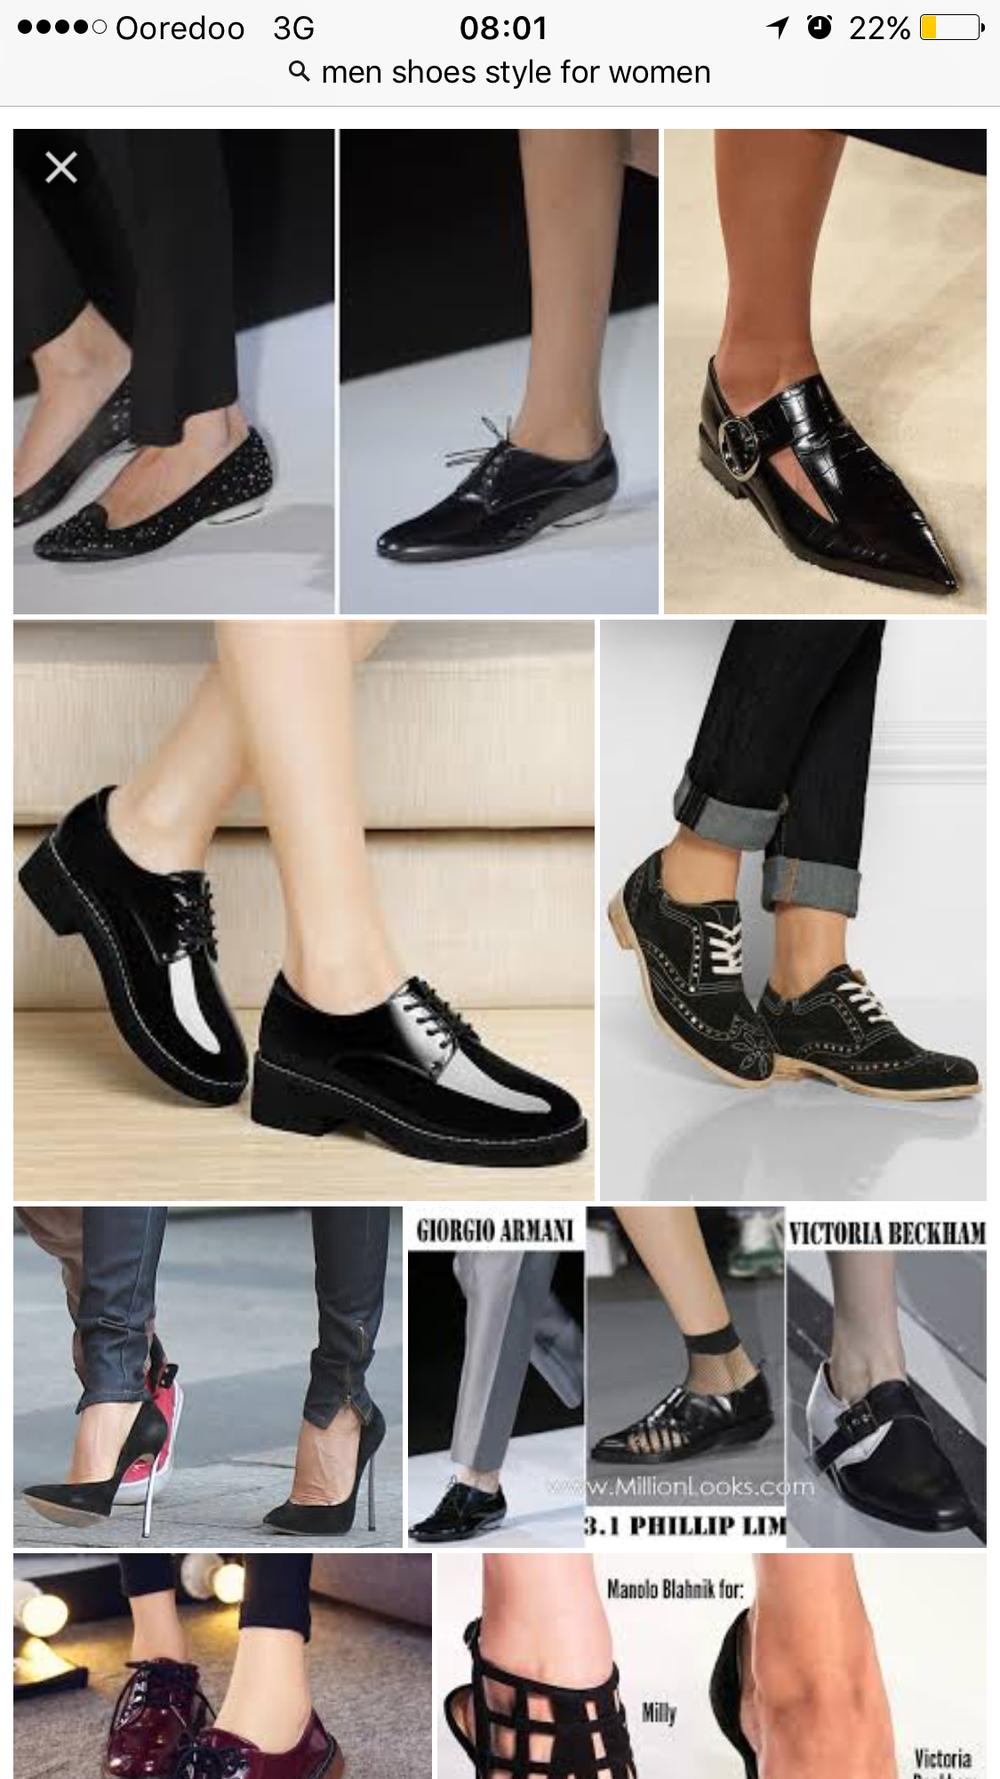 19f07511b Men style shoes. احذيه موديل رجالي للسيدات